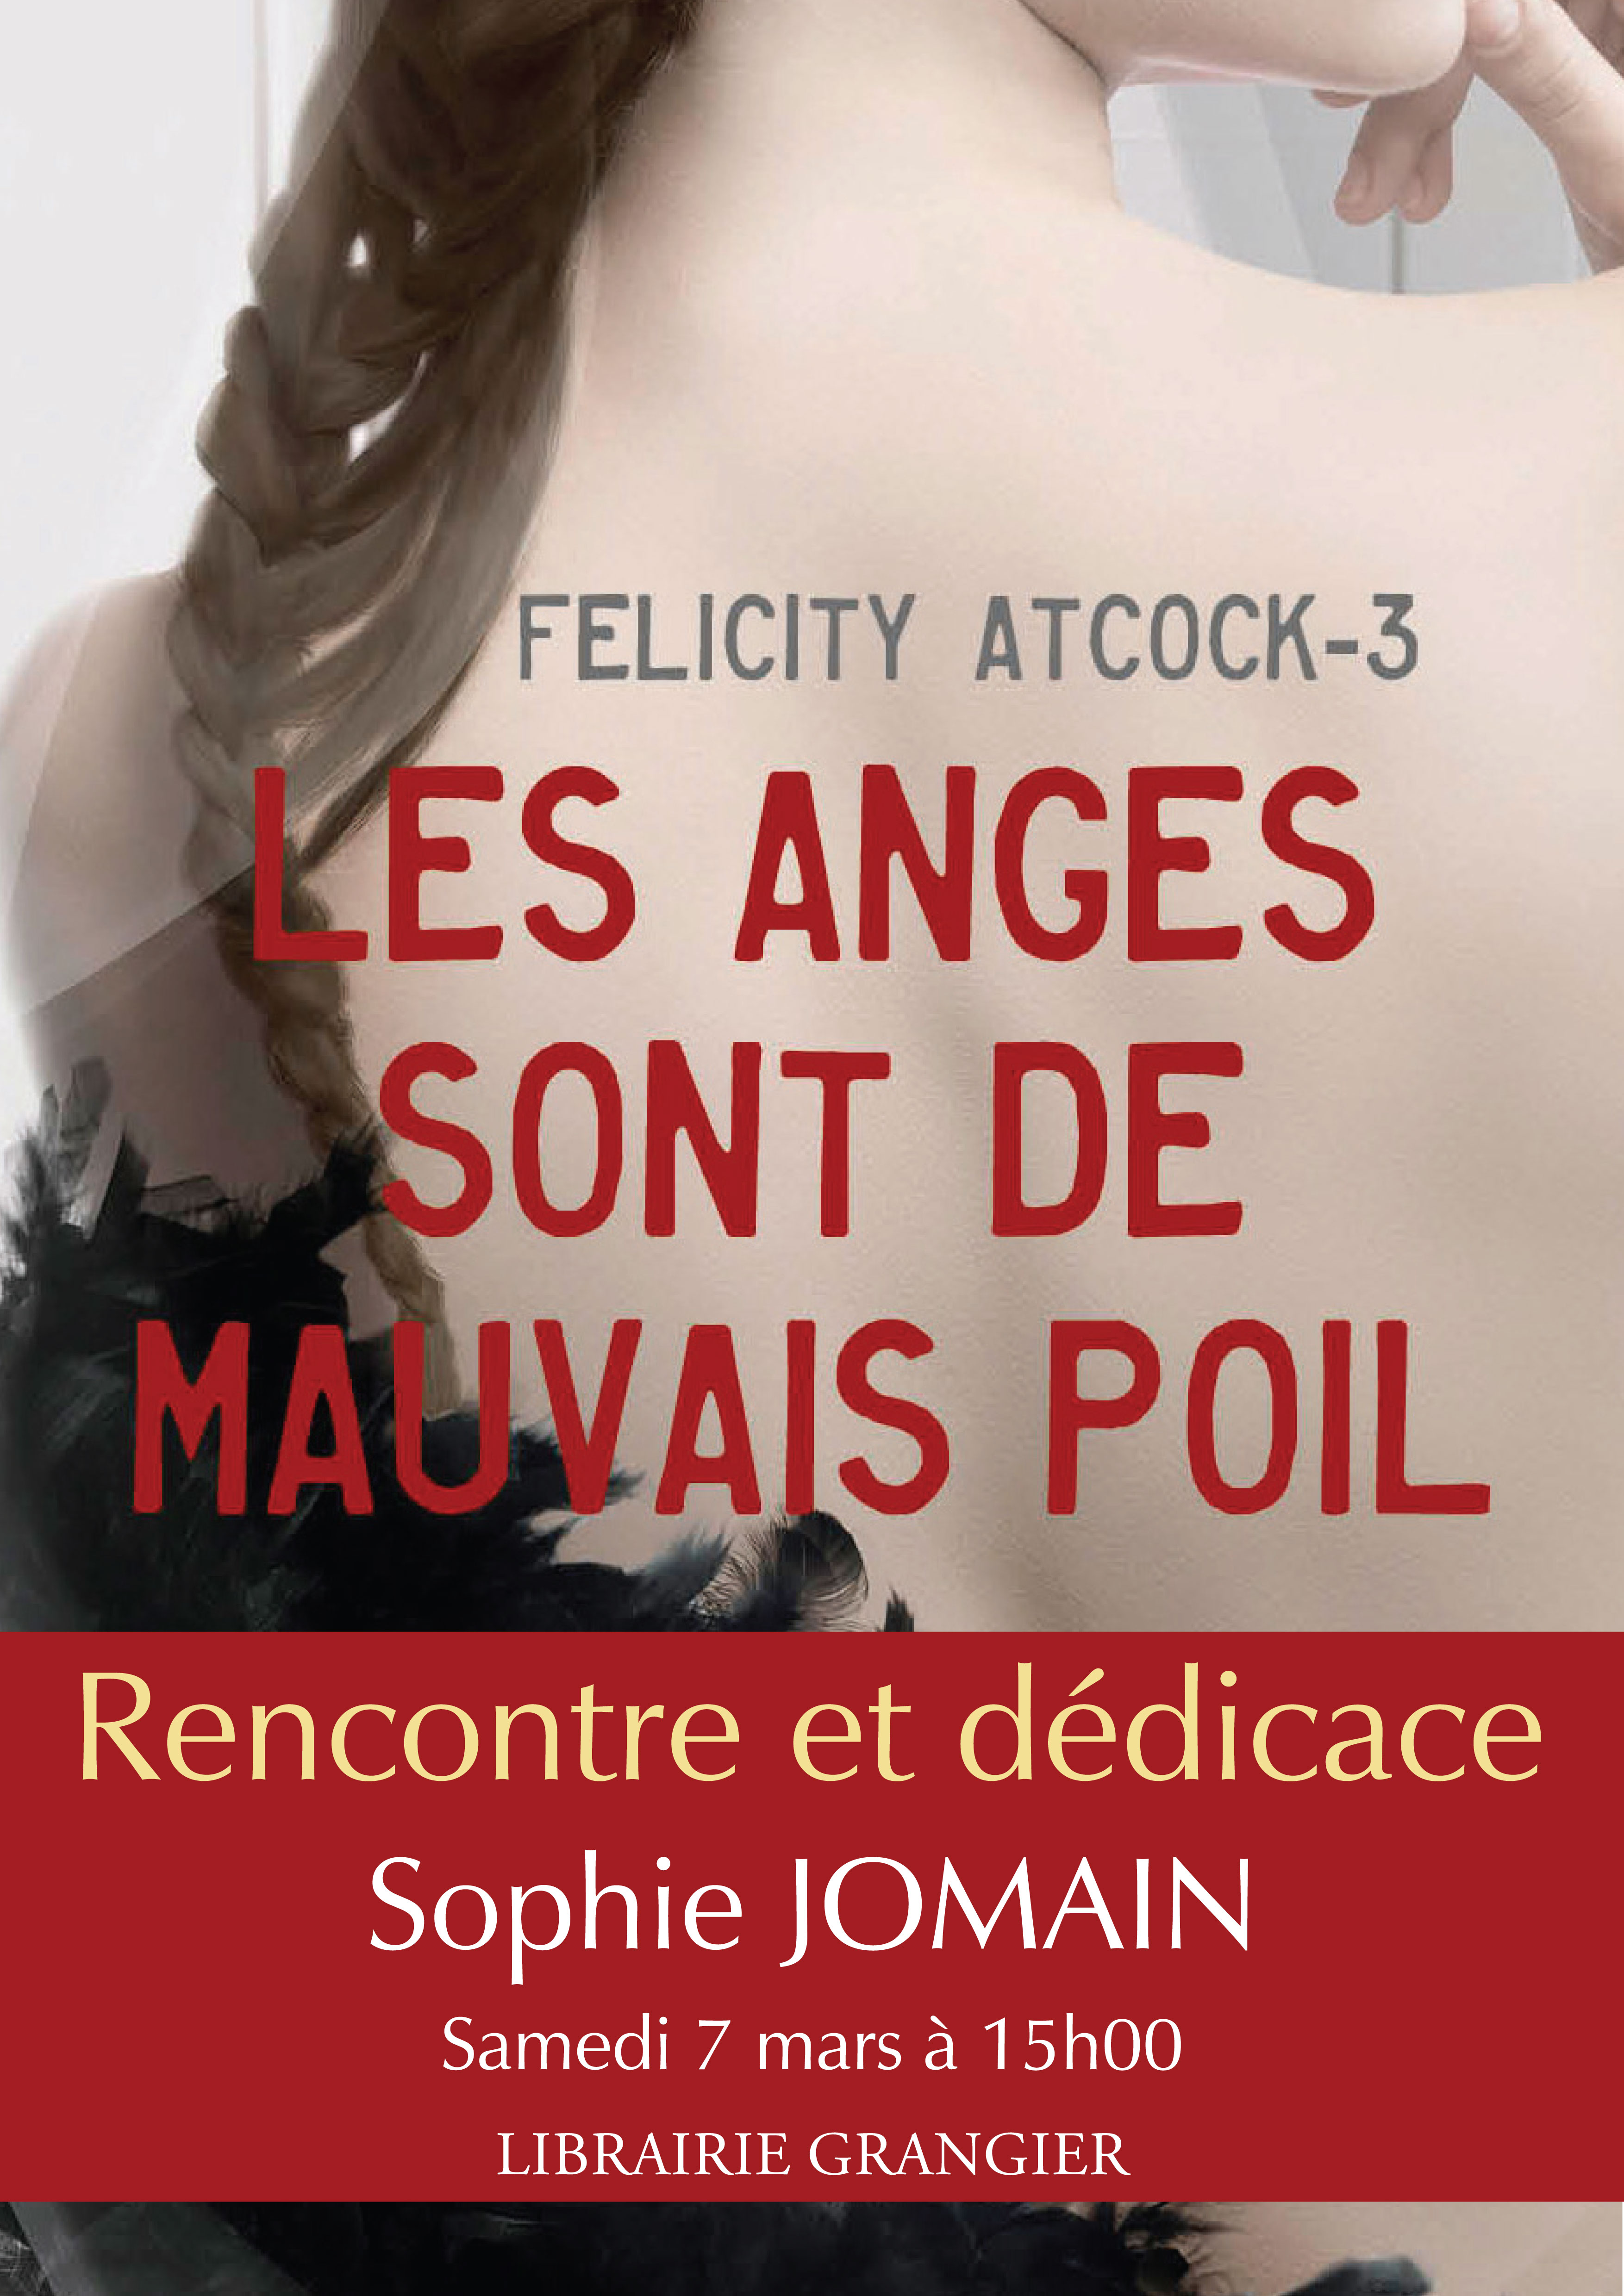 Accueil Sophie Jomain